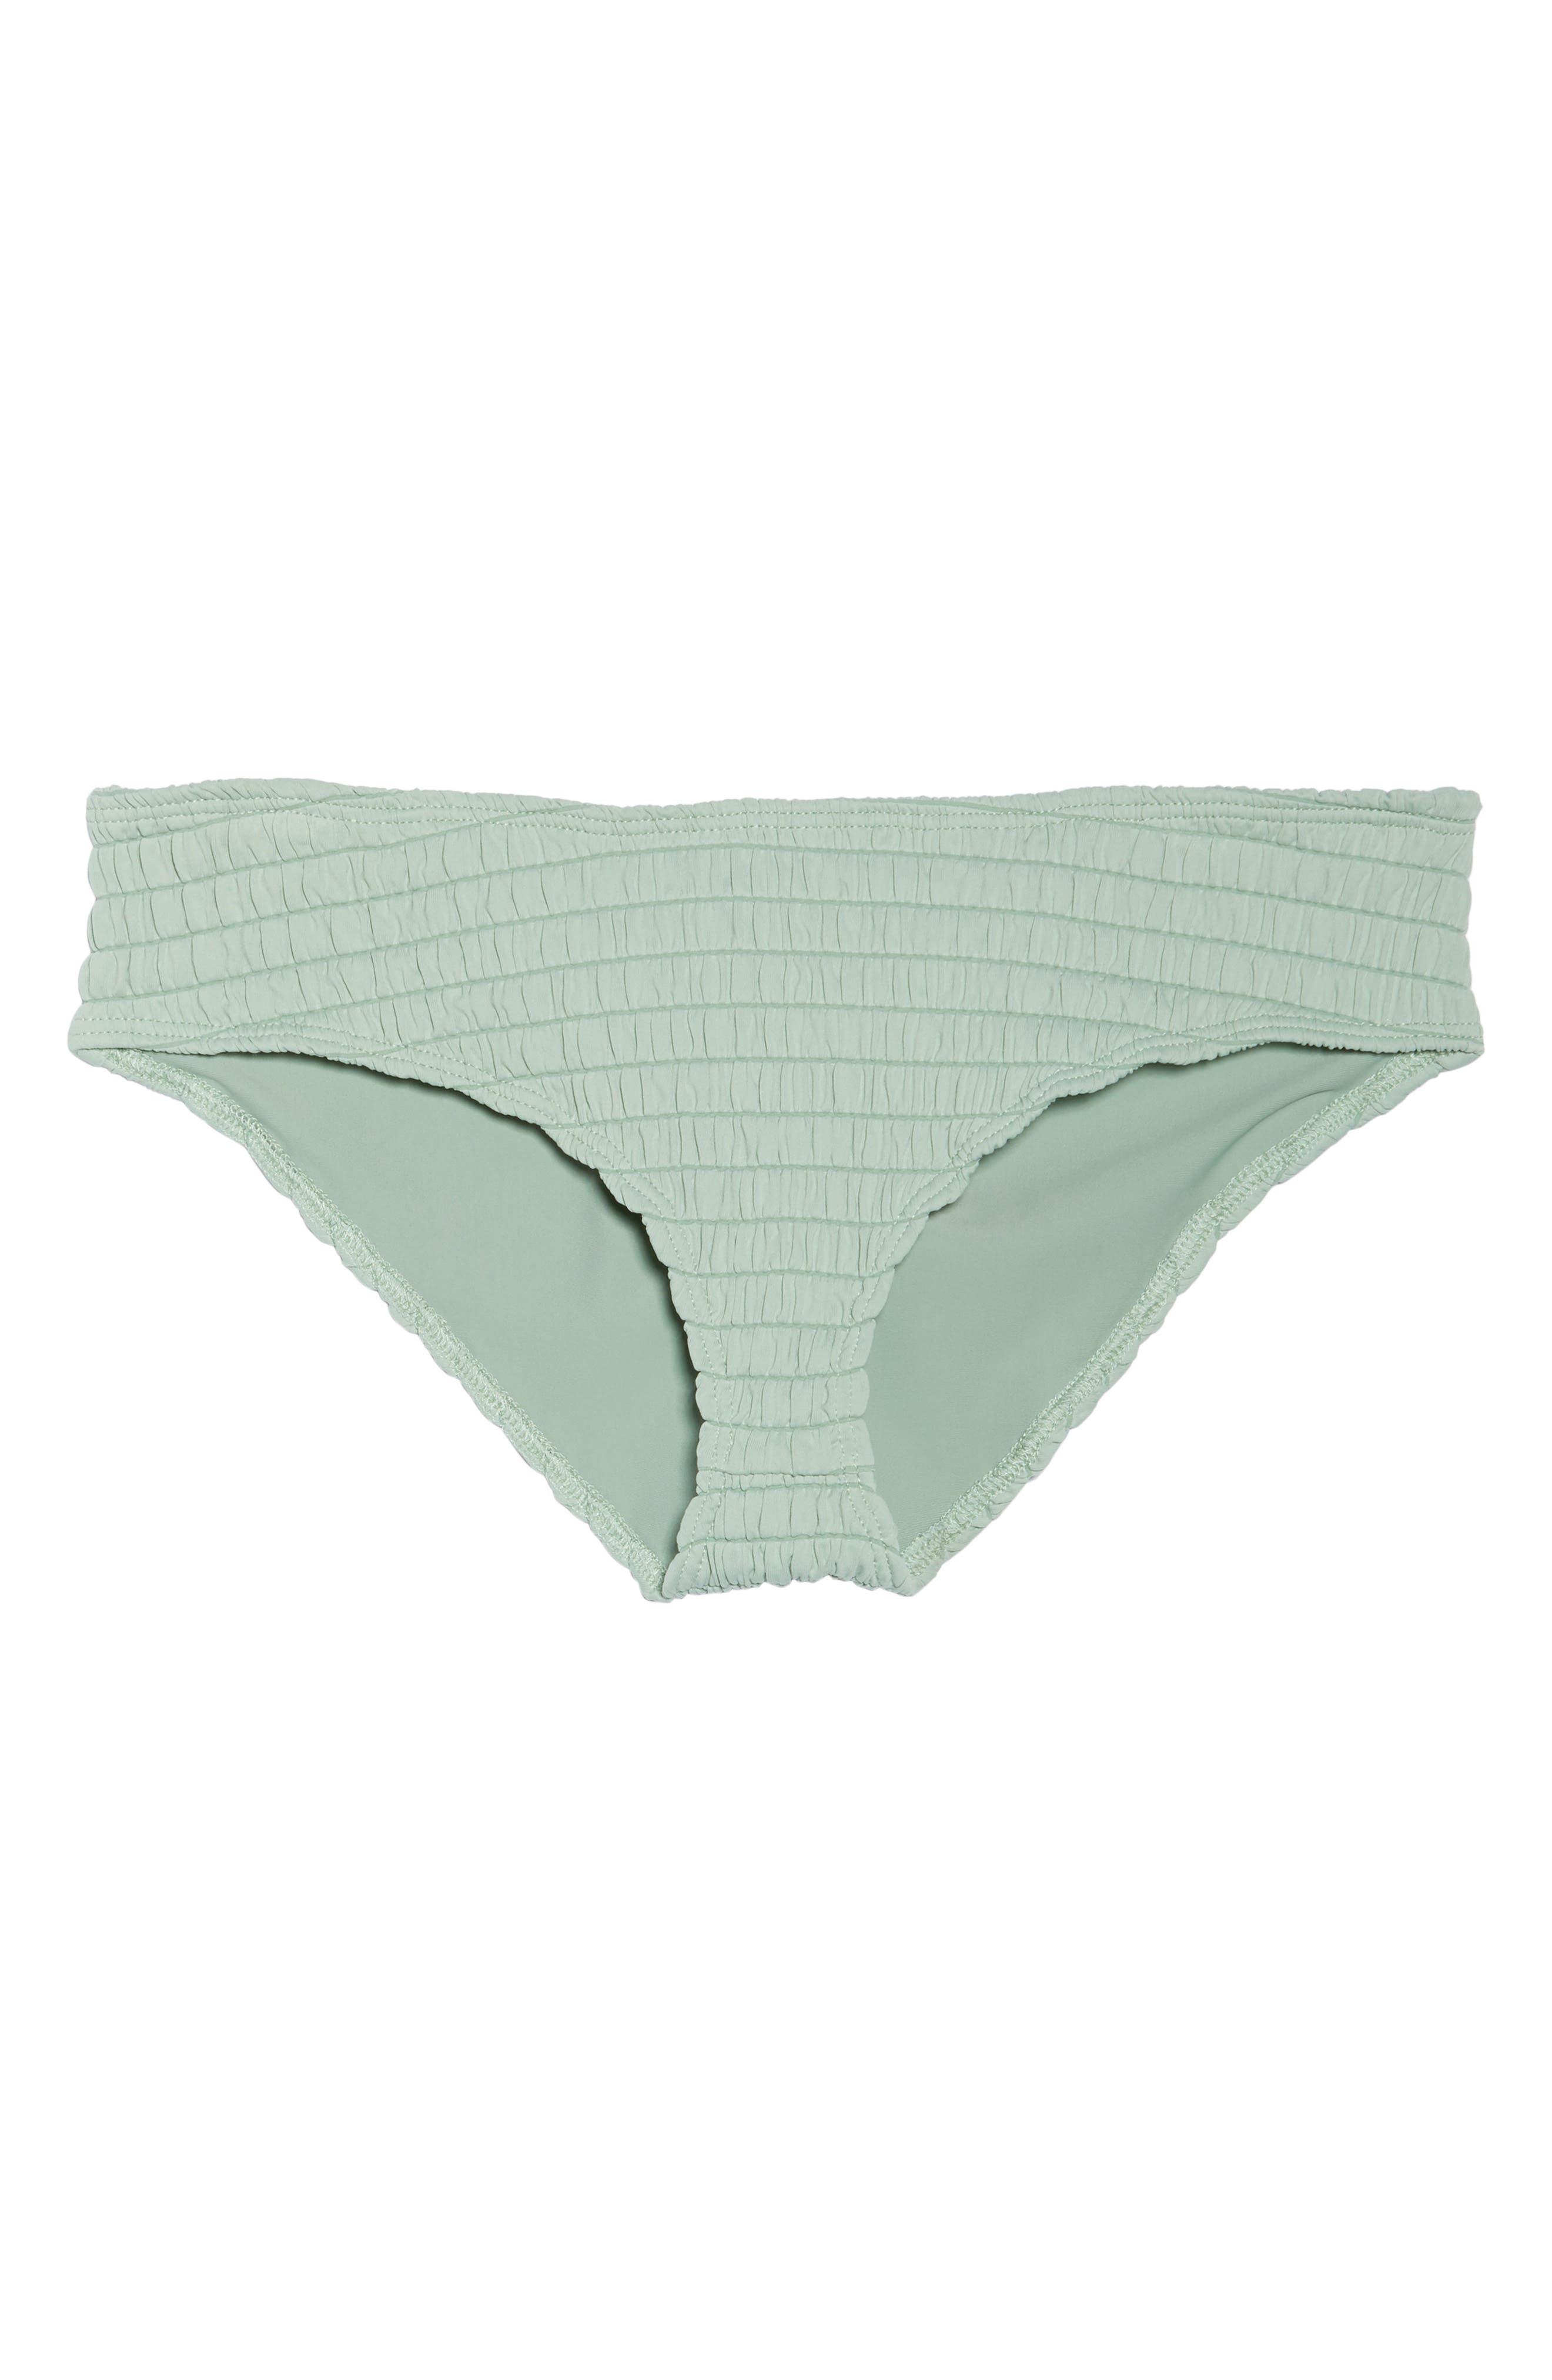 AC Nu Micro Bikini Bottoms,                             Alternate thumbnail 6, color,                             PISTACHE SCRUNCH GREEN